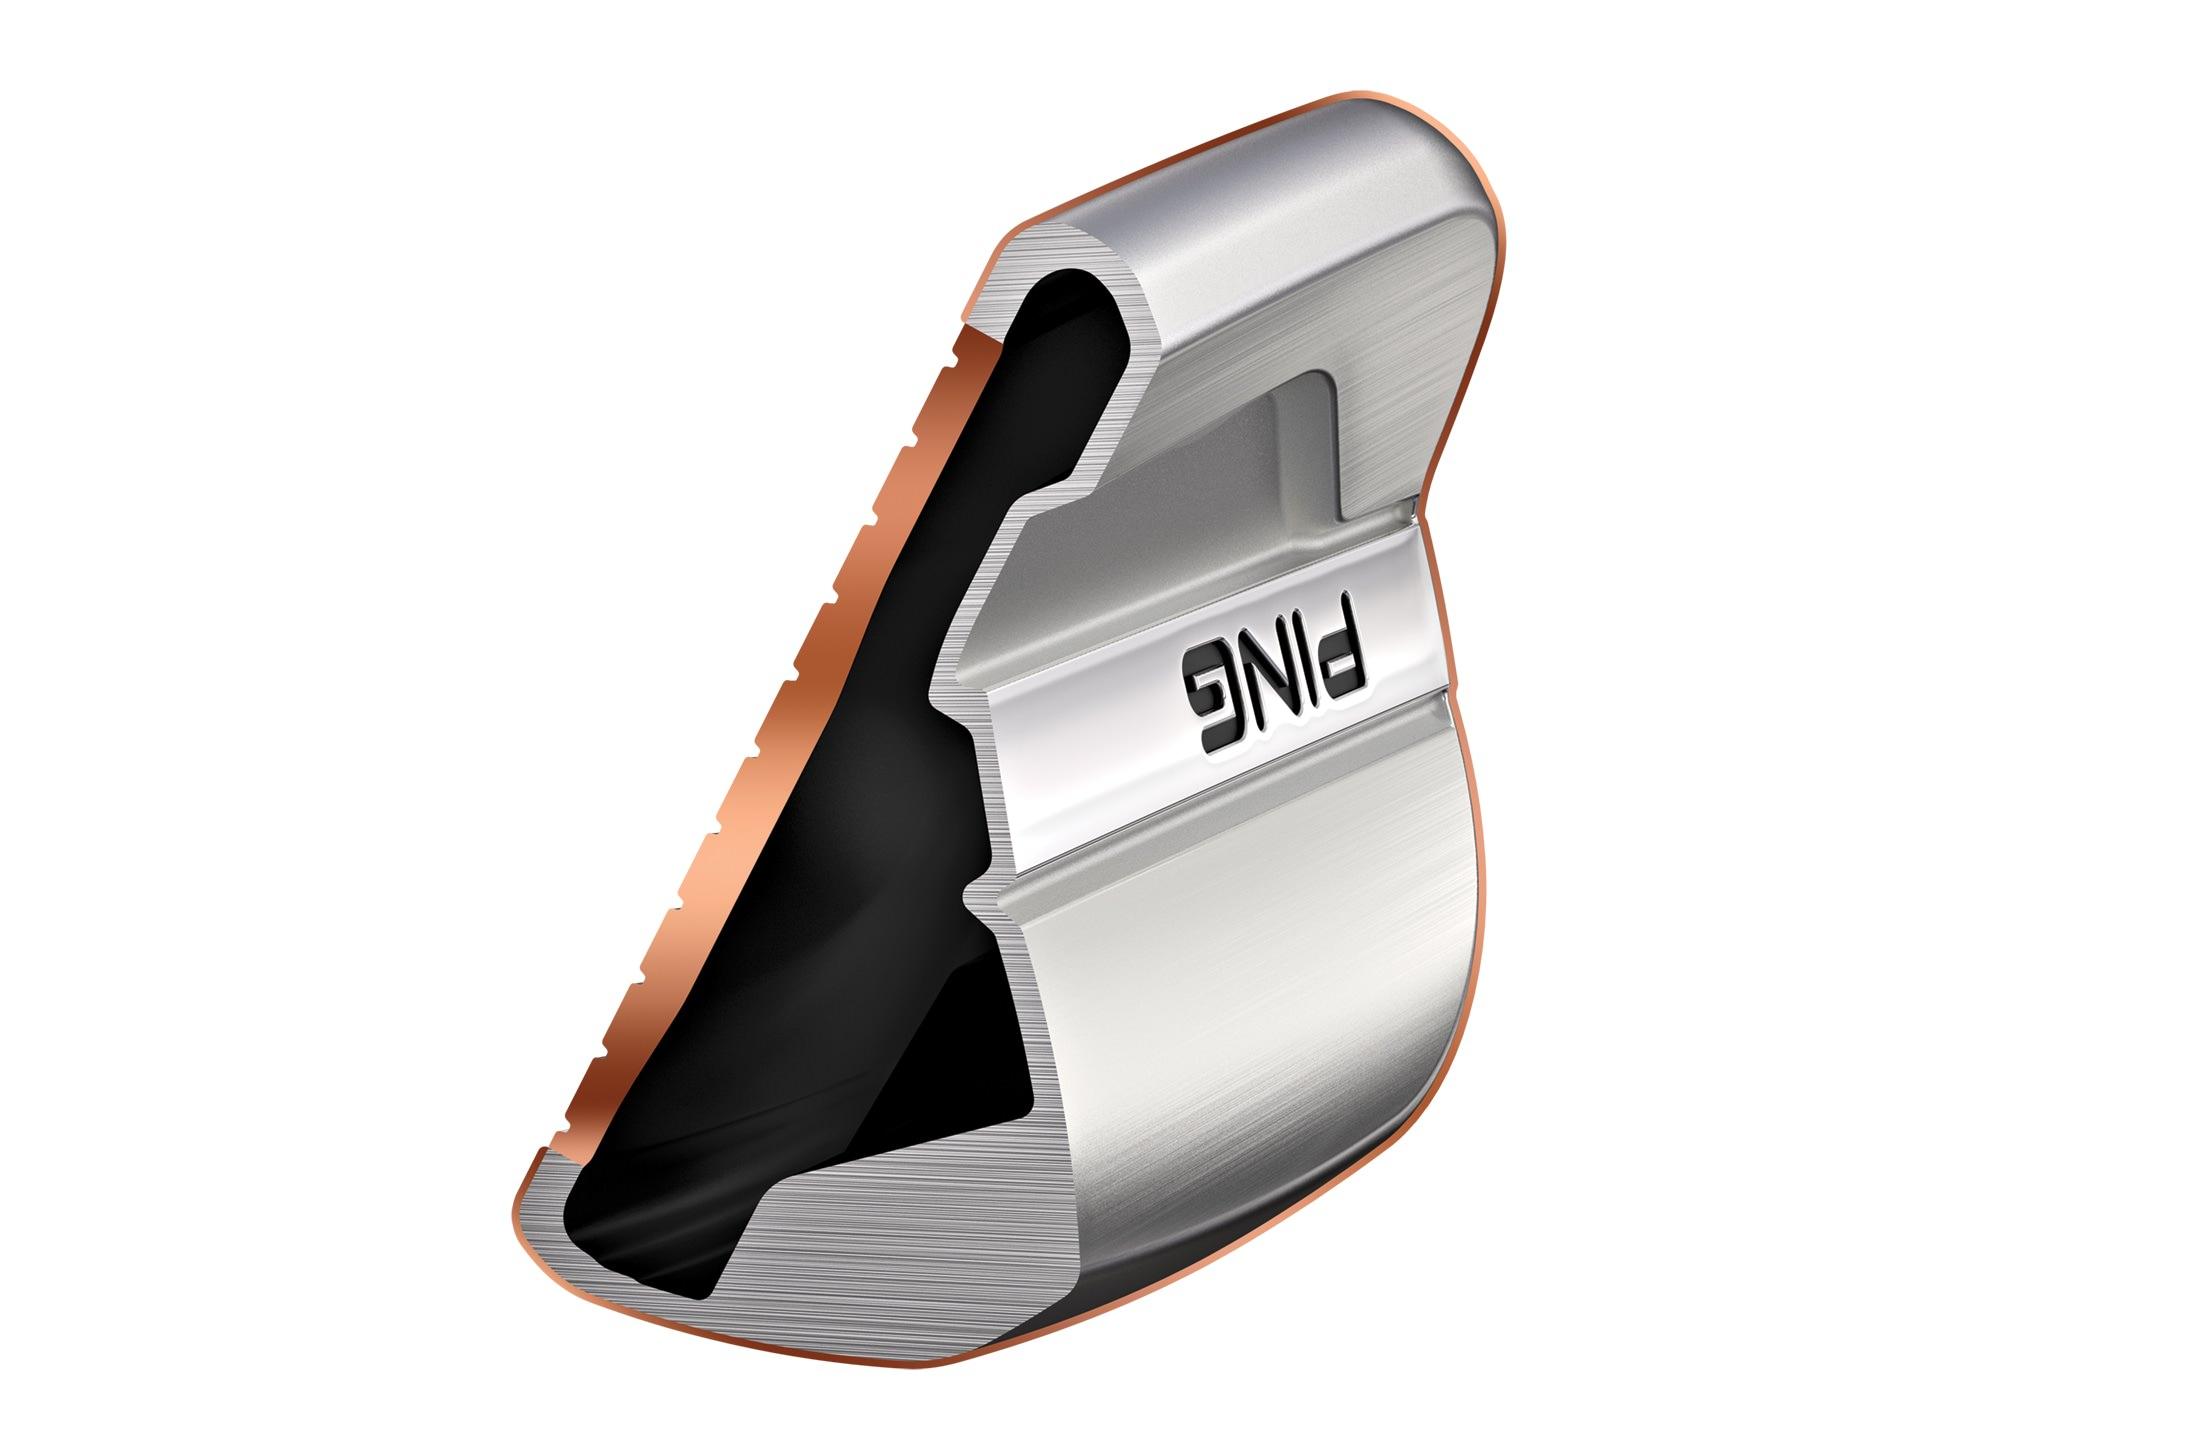 Ping G700 irons